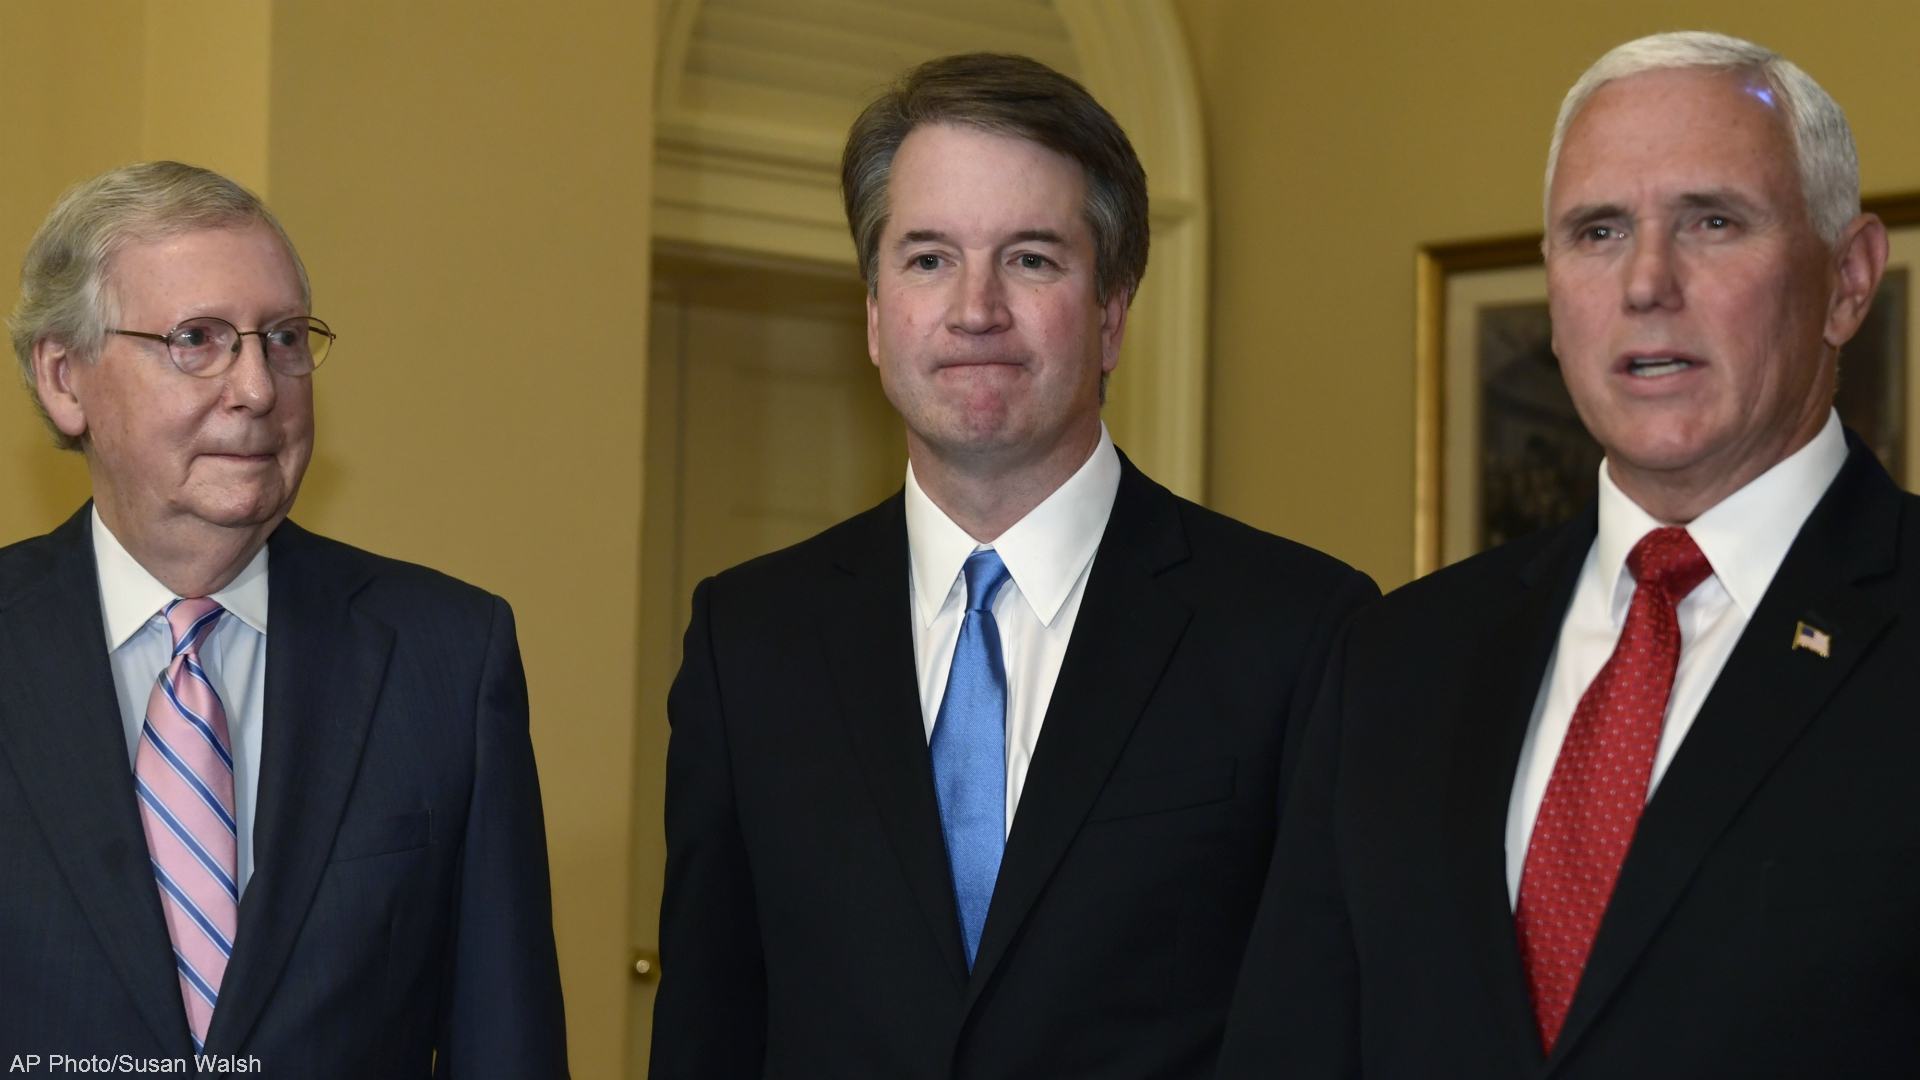 supreme court nominee brett kavanaugh vice president mike pence senate majority leader mitch mcconnell 071018 AP_1531252215720.jpg.jpg